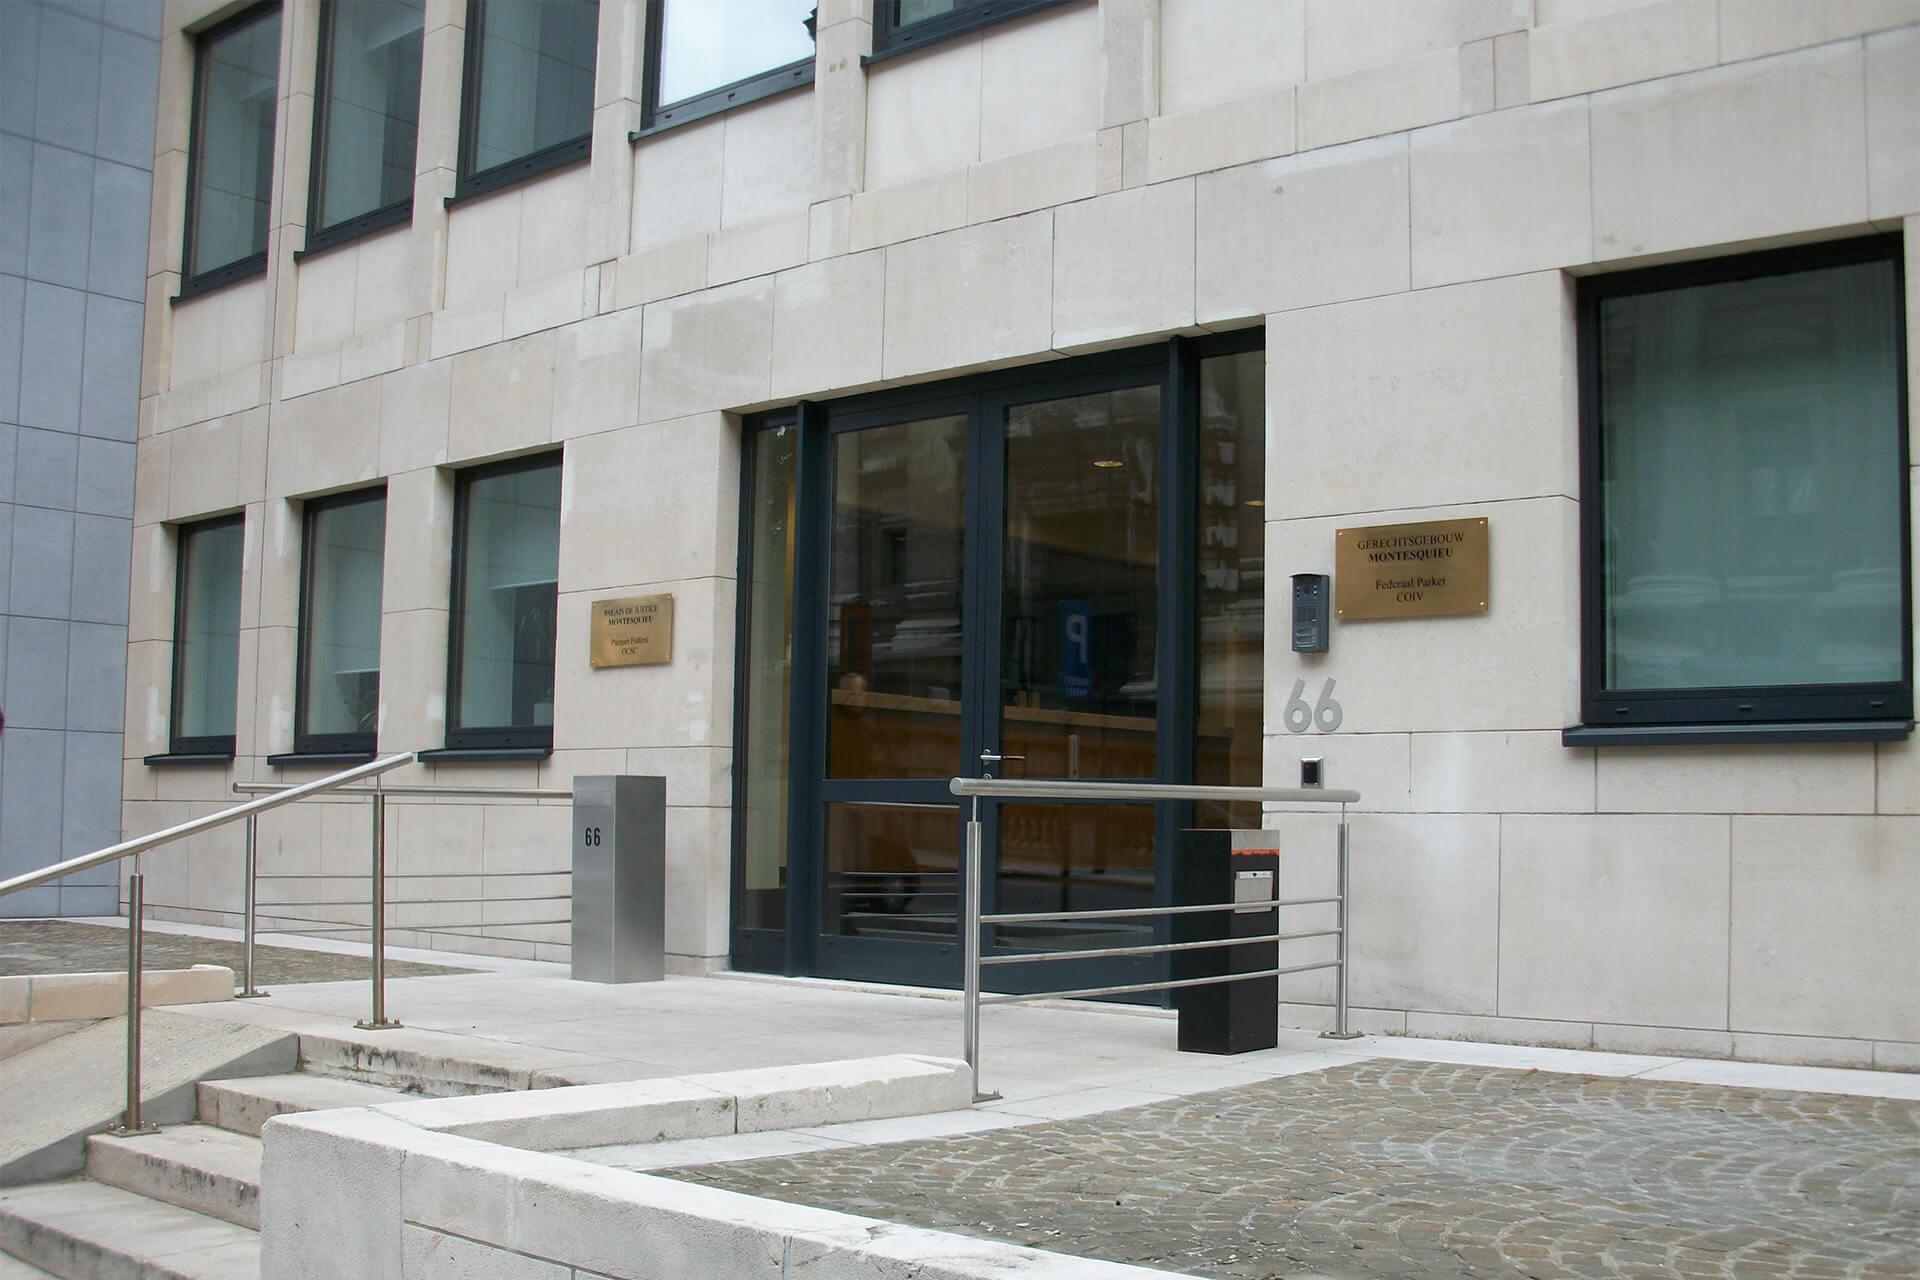 Brüssel, Justizpalast, Verwaltungsgebäude